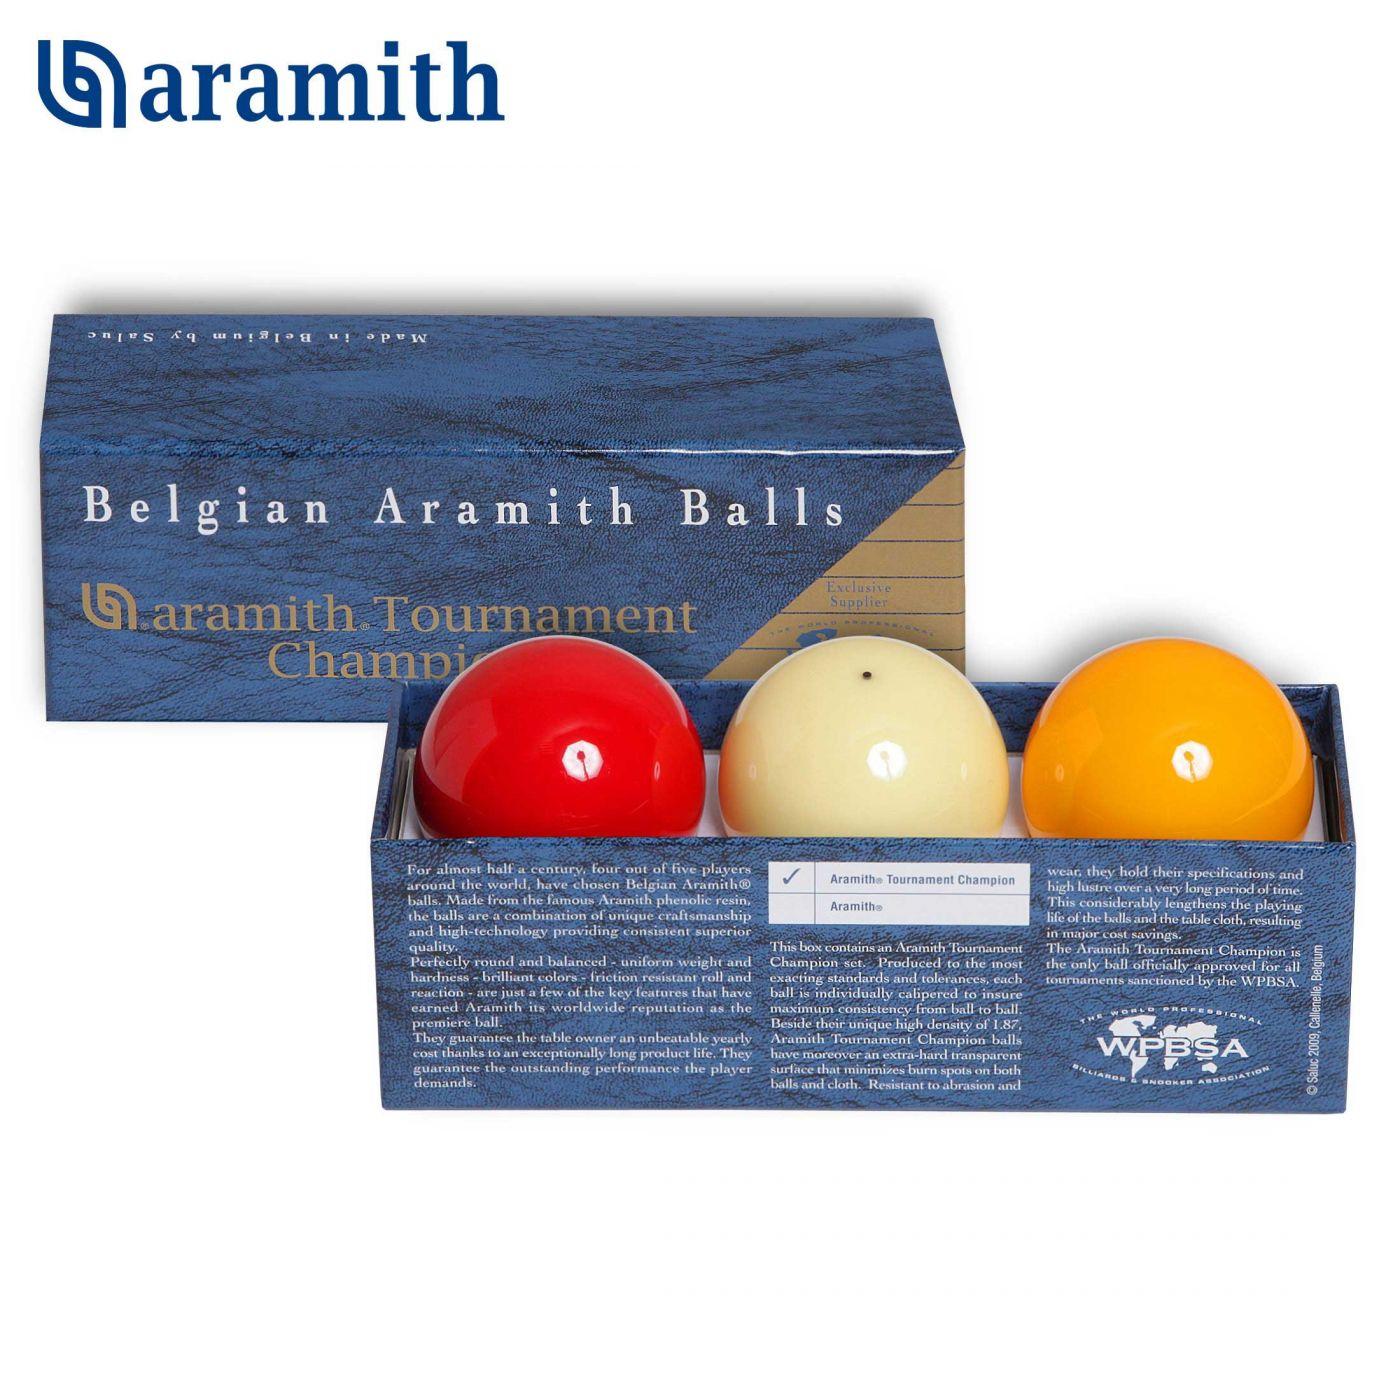 Шары Aramith Tournament Champion Snooker ø52,4мм 3шара, артикул 06619